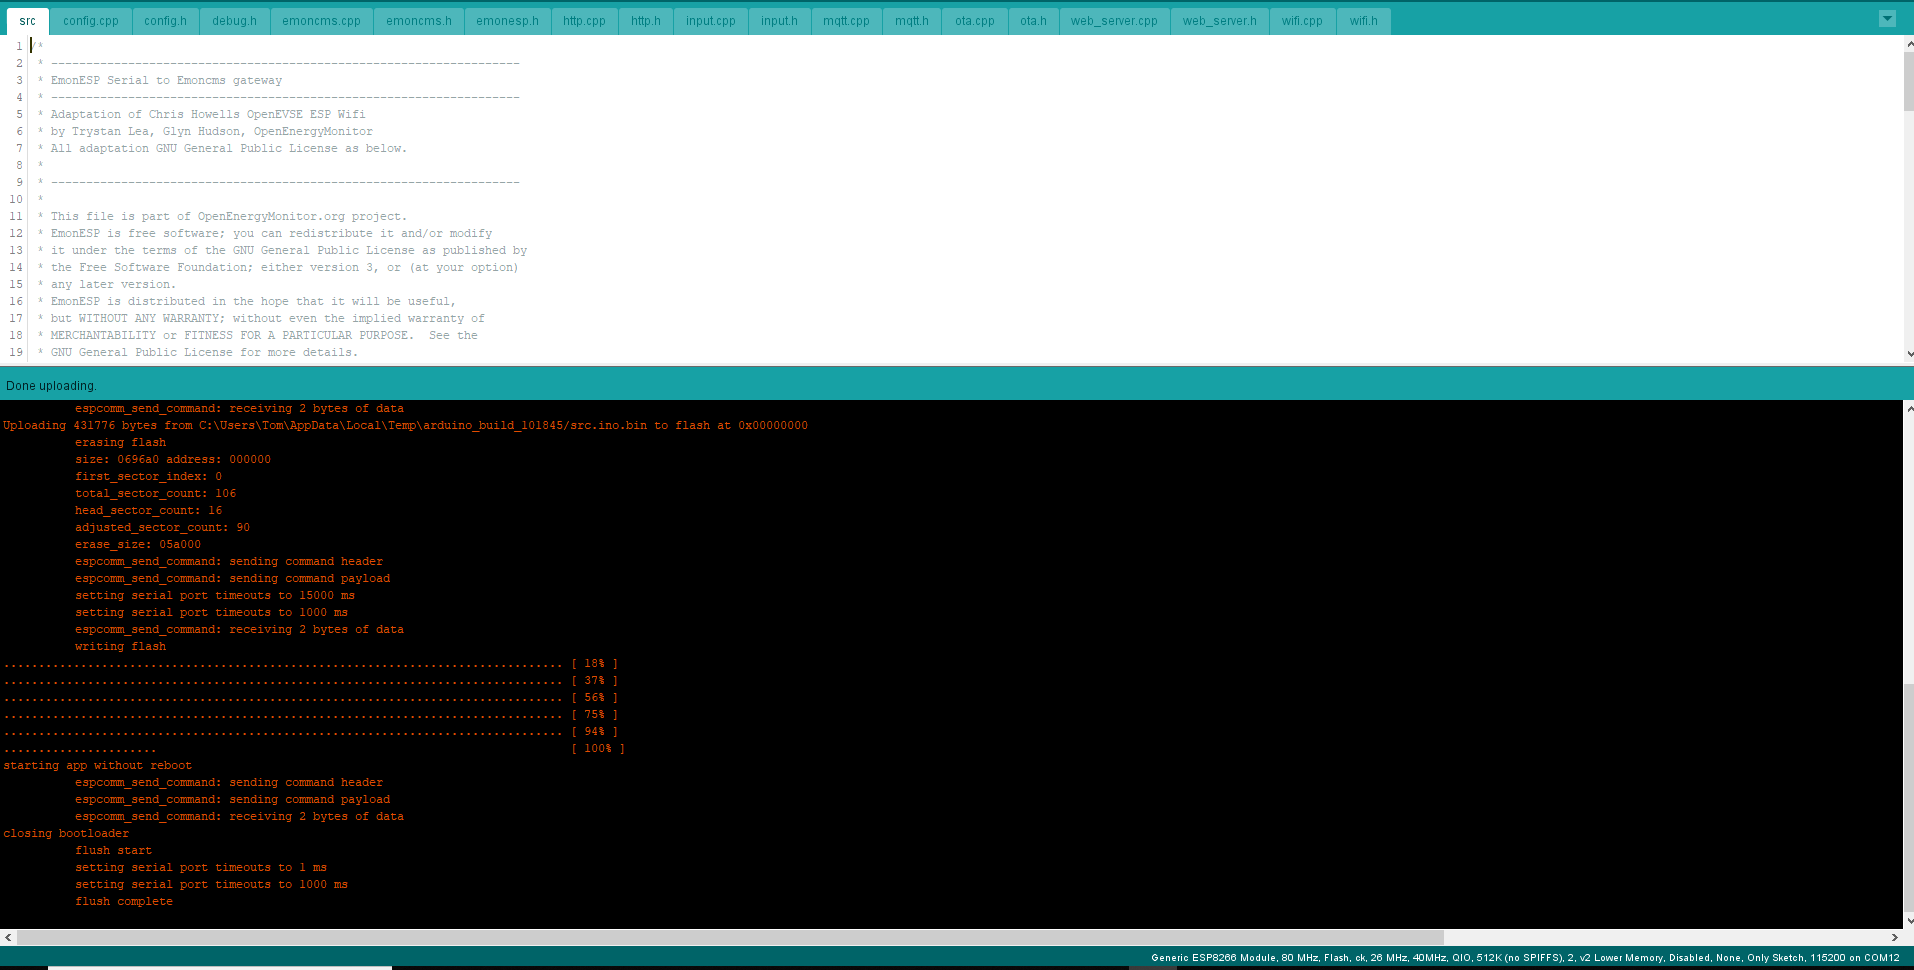 Bootloader mode for esp8266 (Heatpump monitor board